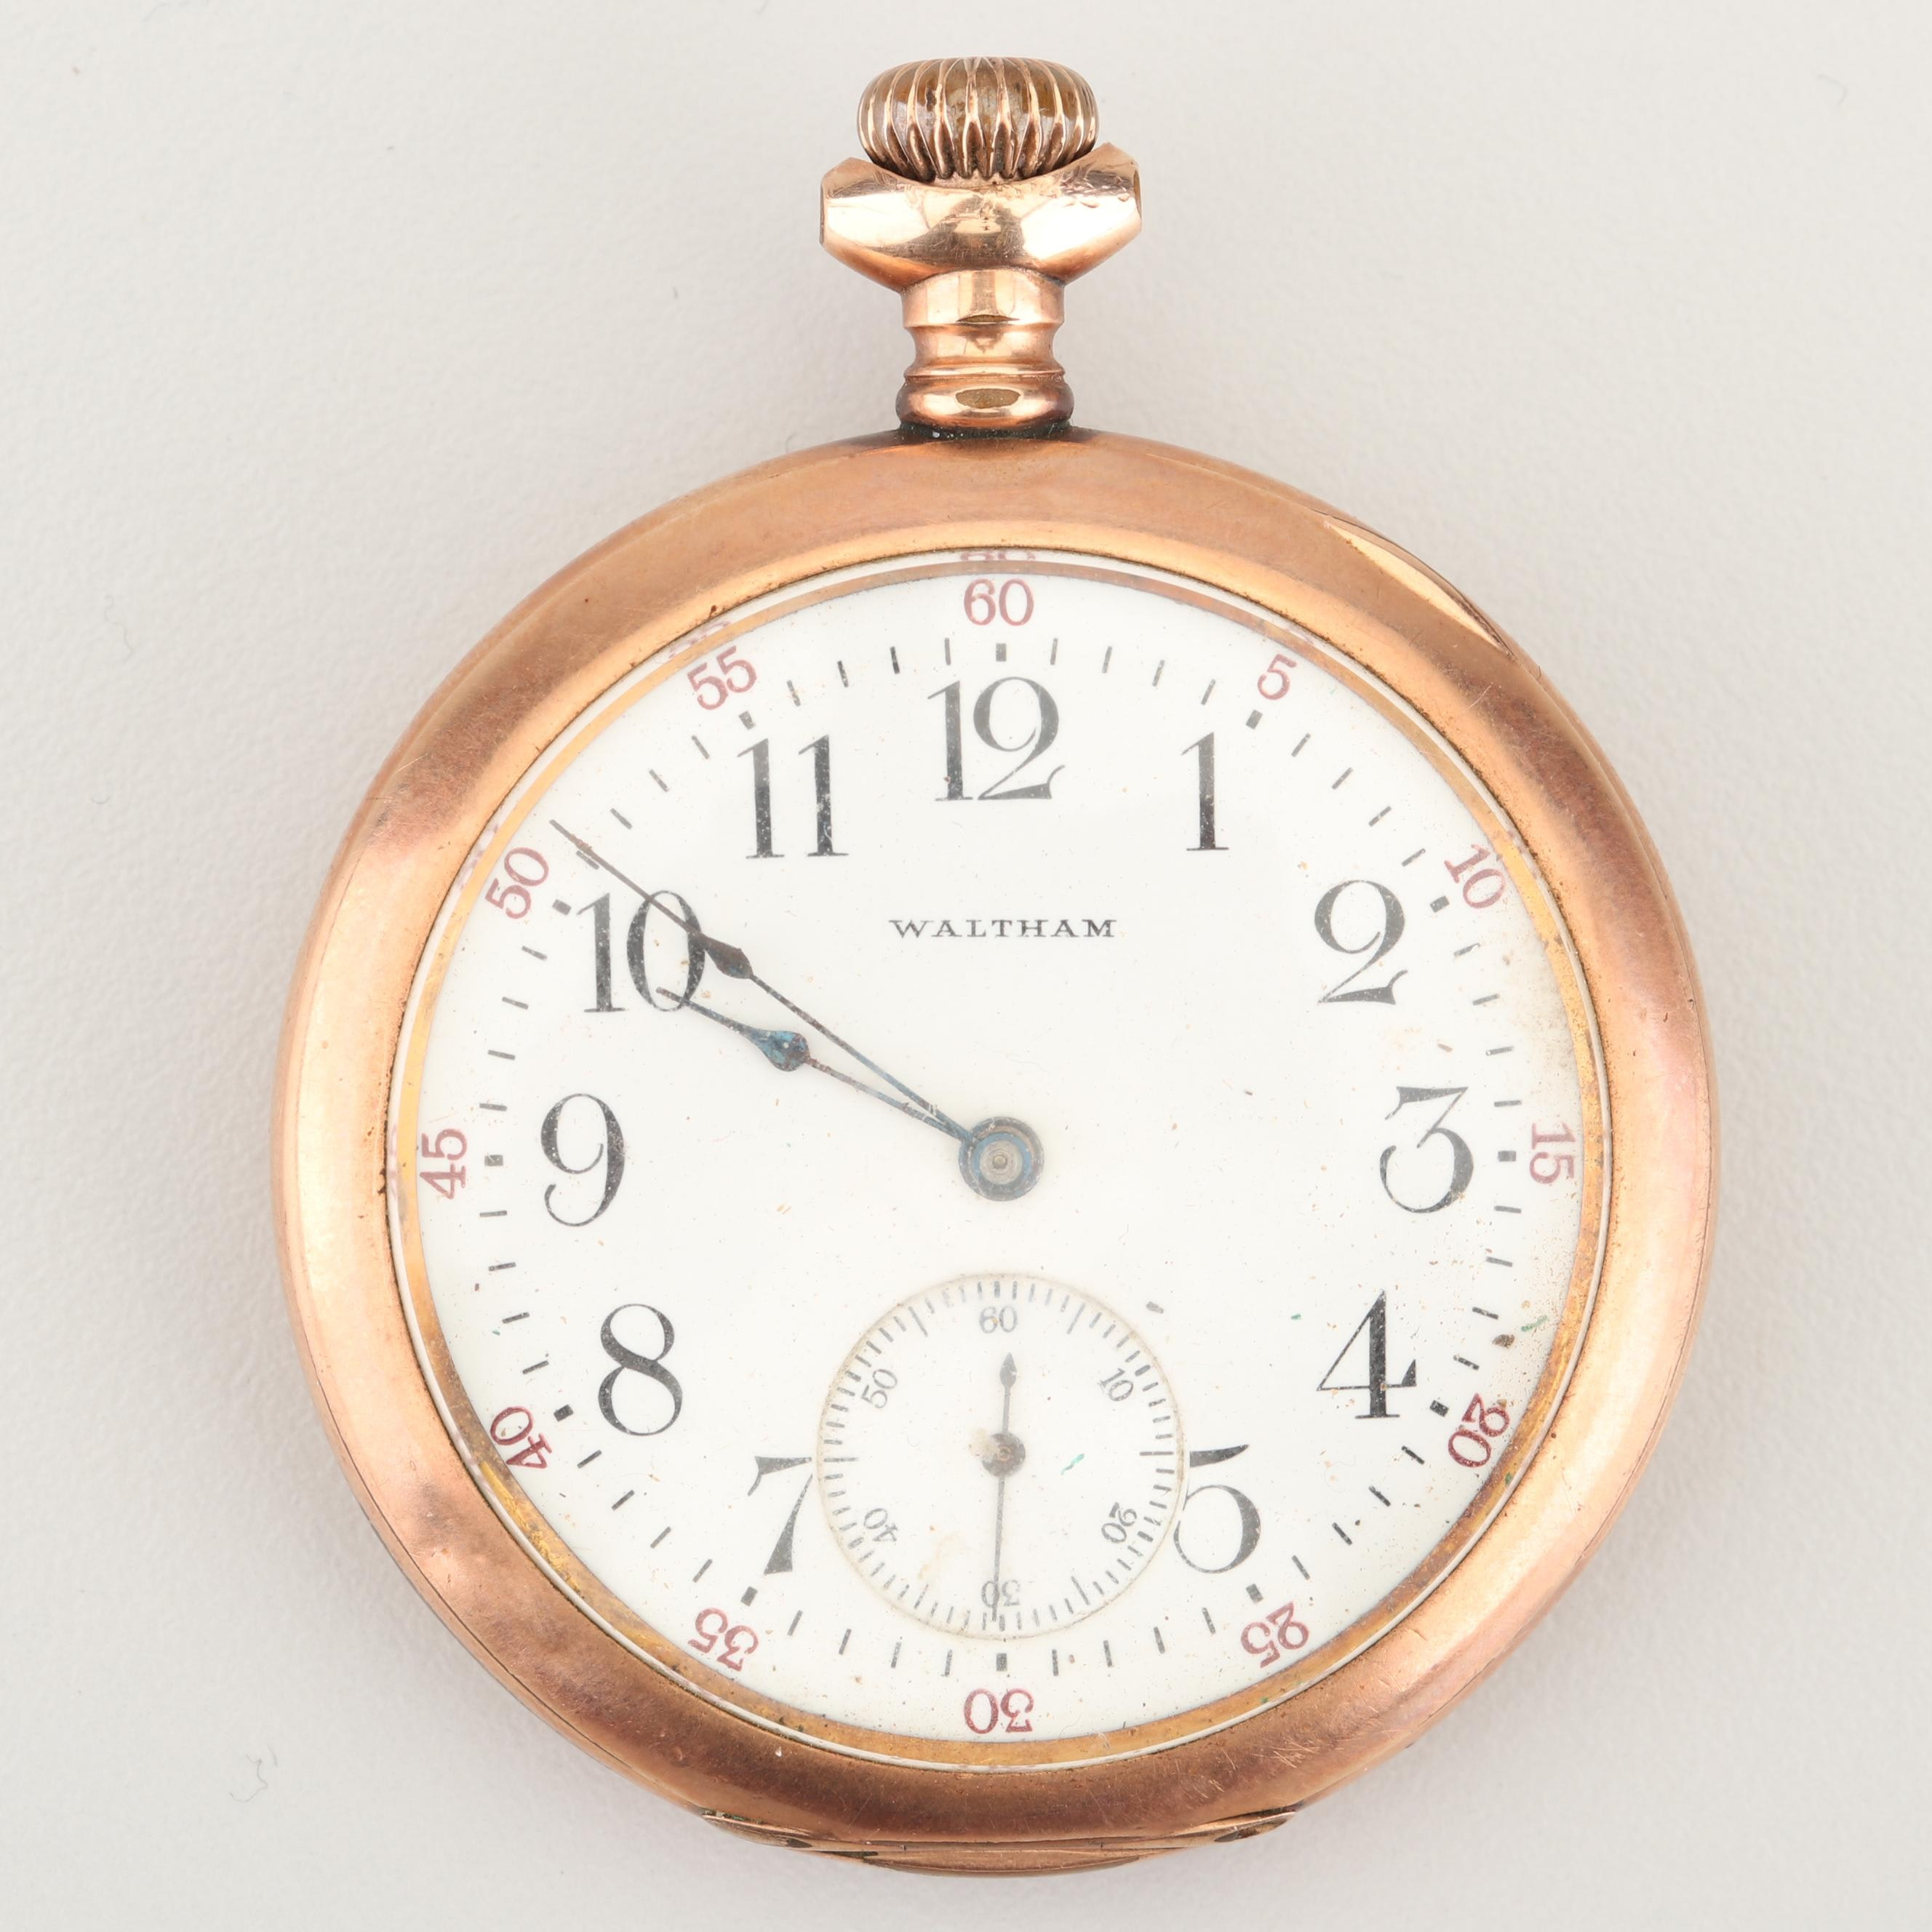 Antique Waltham Gold Filled Pocket Watch